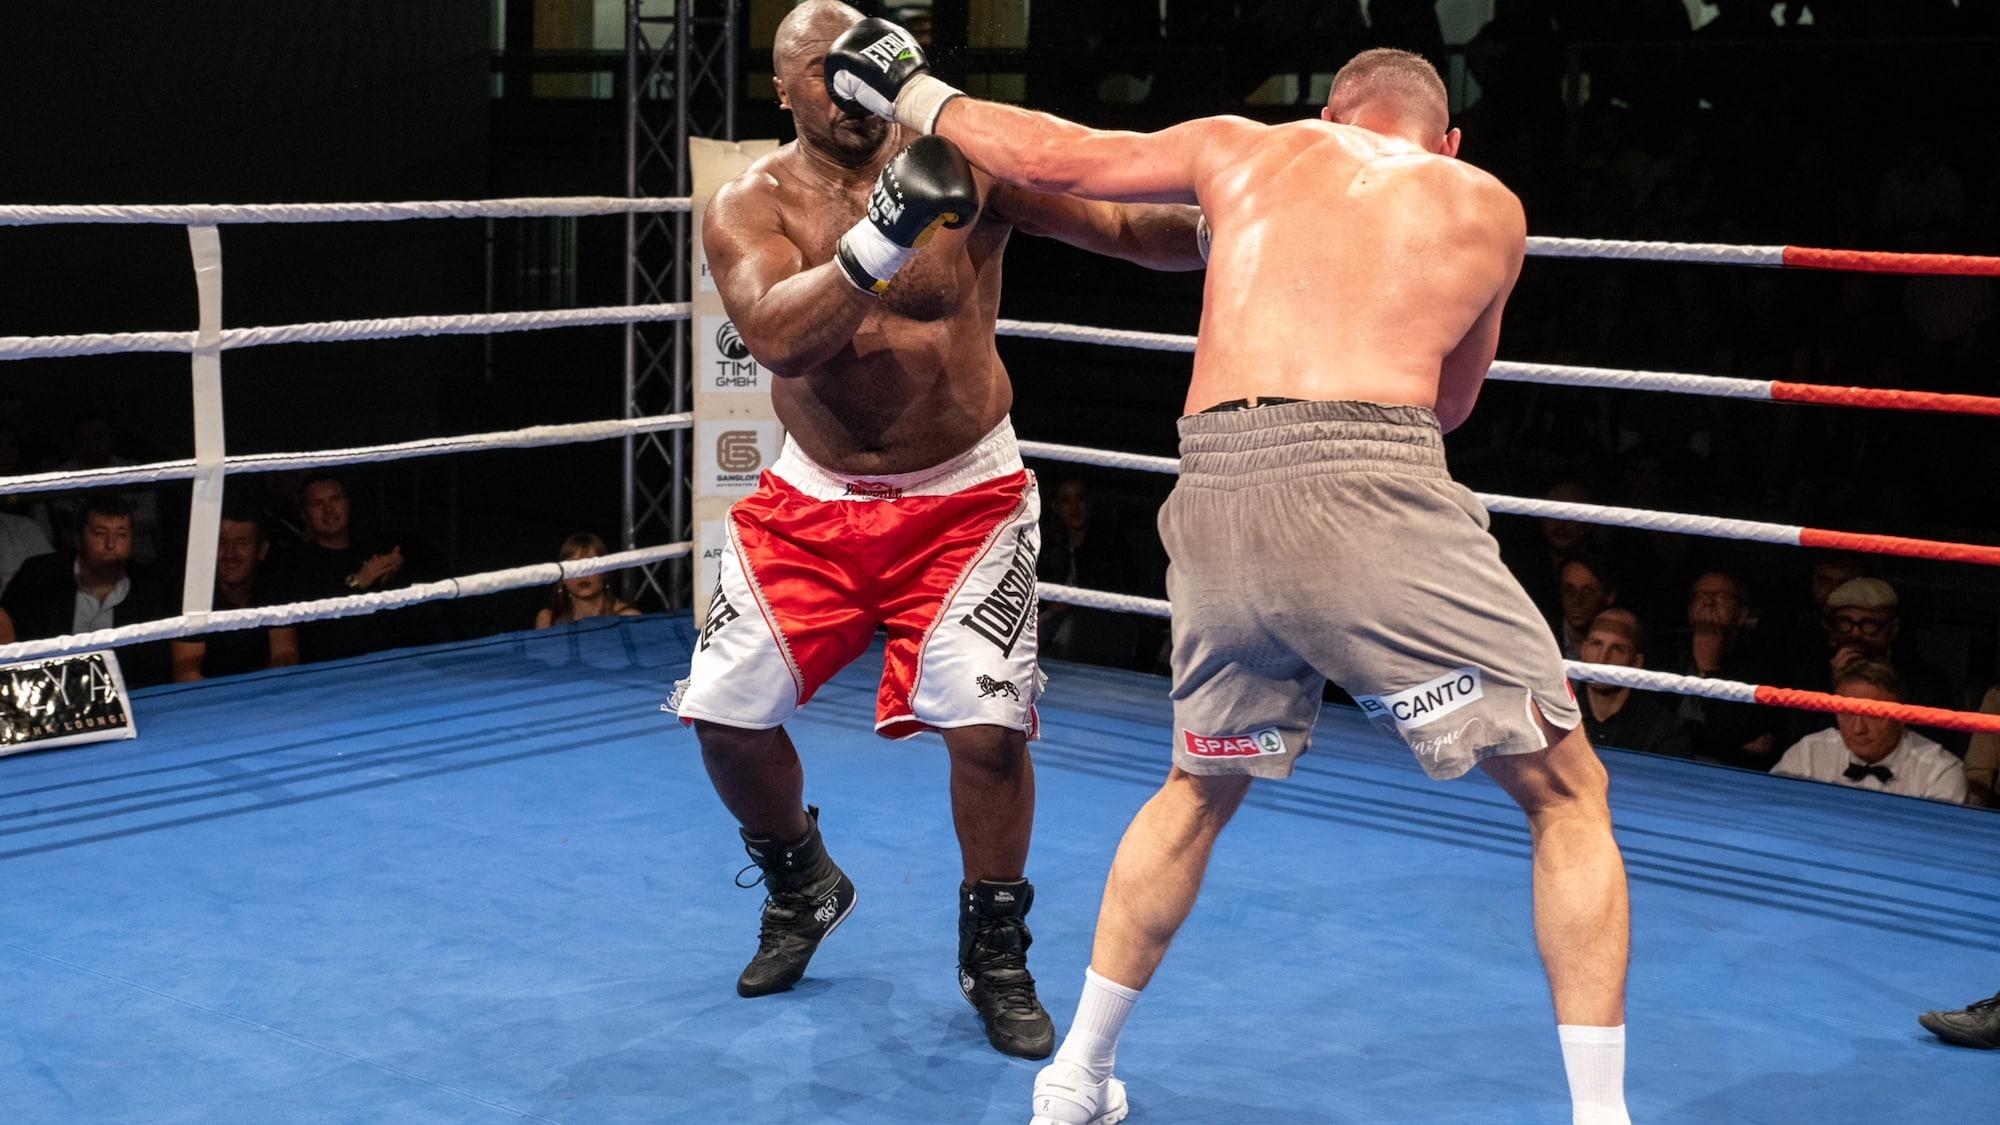 Wilder Kampf gegen Moyo: Gjergjaj liefert wichtigen Sieg trotz Rippenbruch